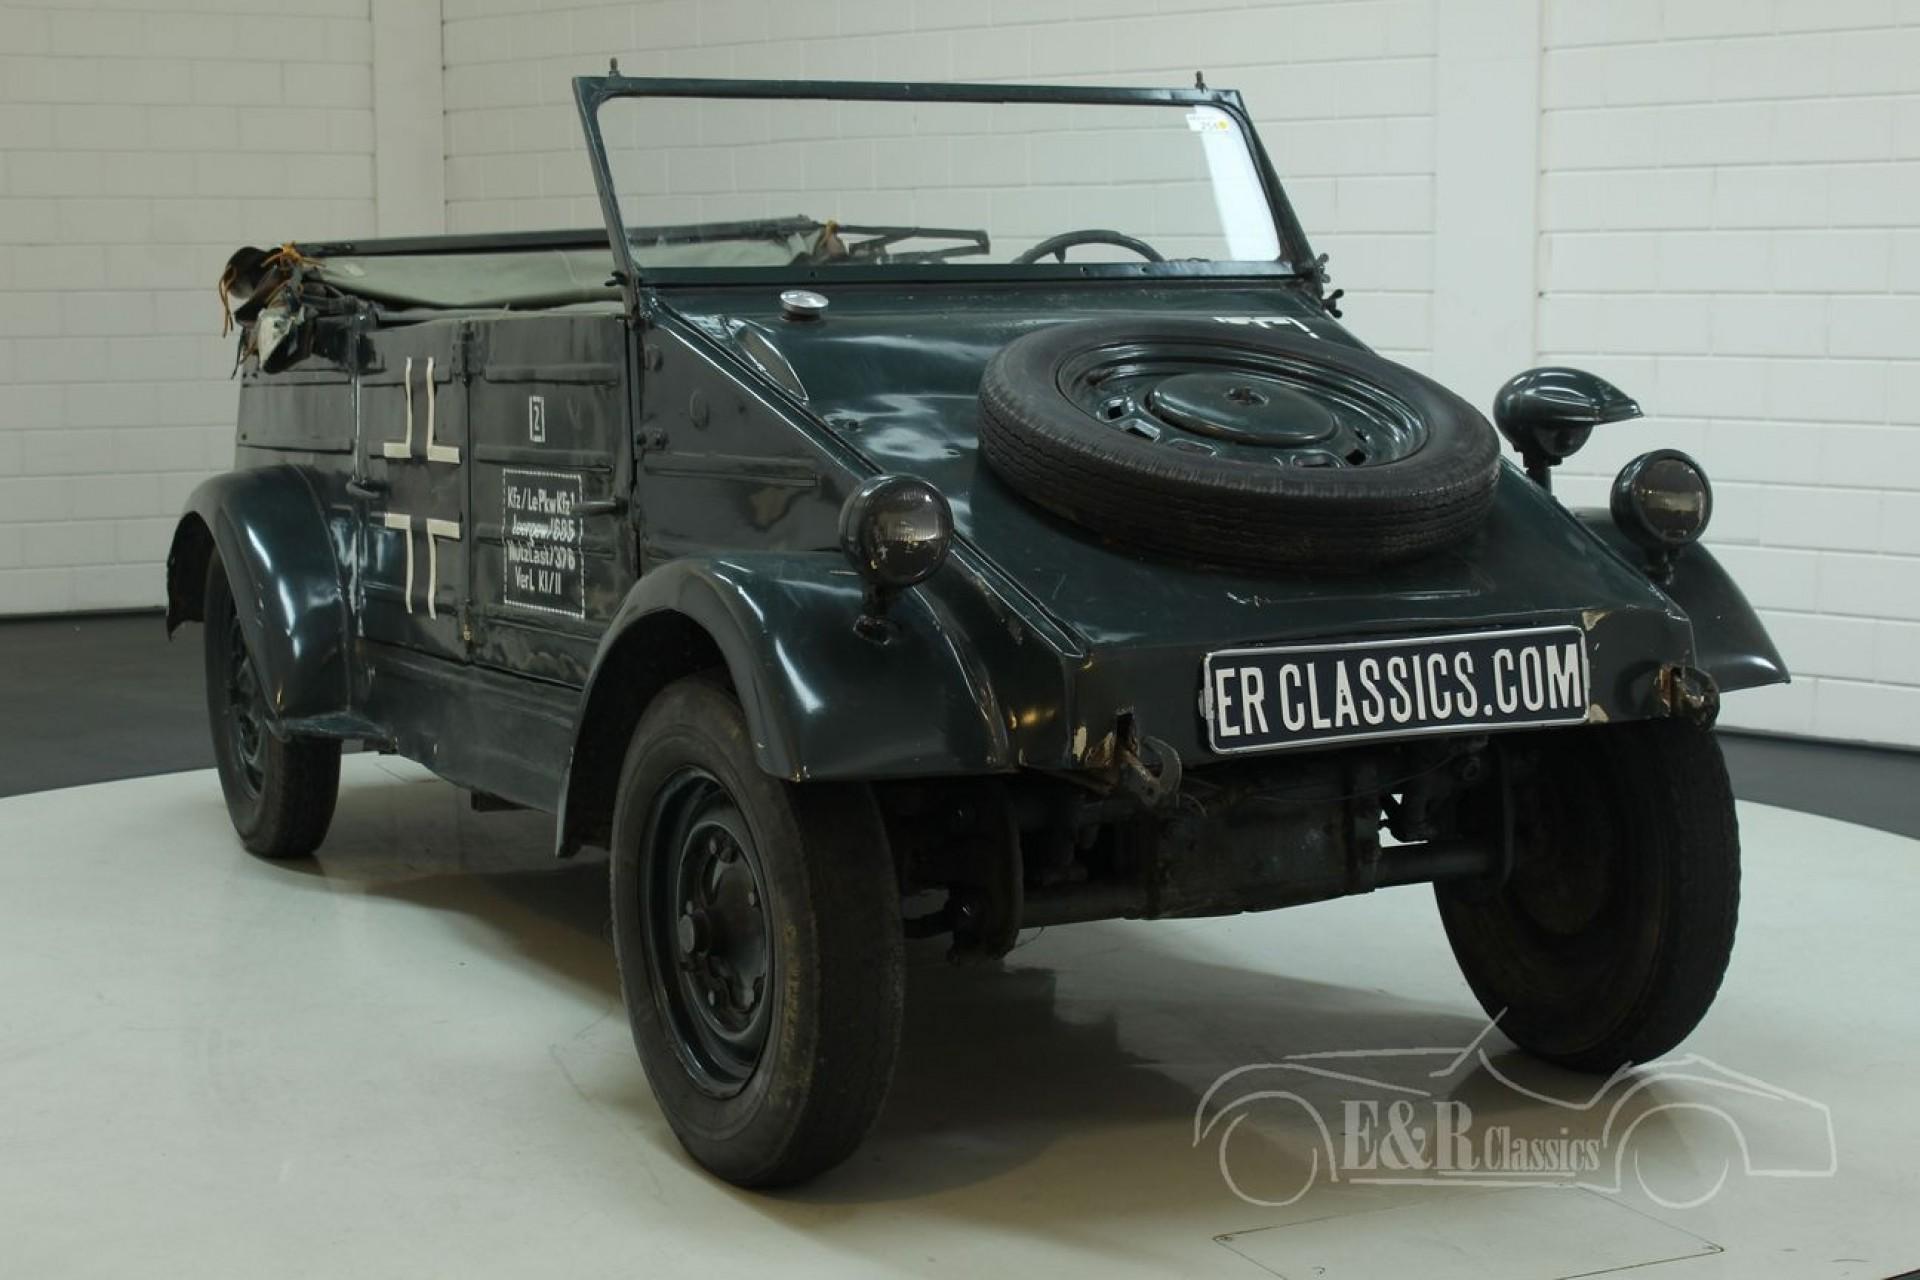 Car Craft Vw >> Volkswagen Kubelwagen 1942 for sale at ERclassics